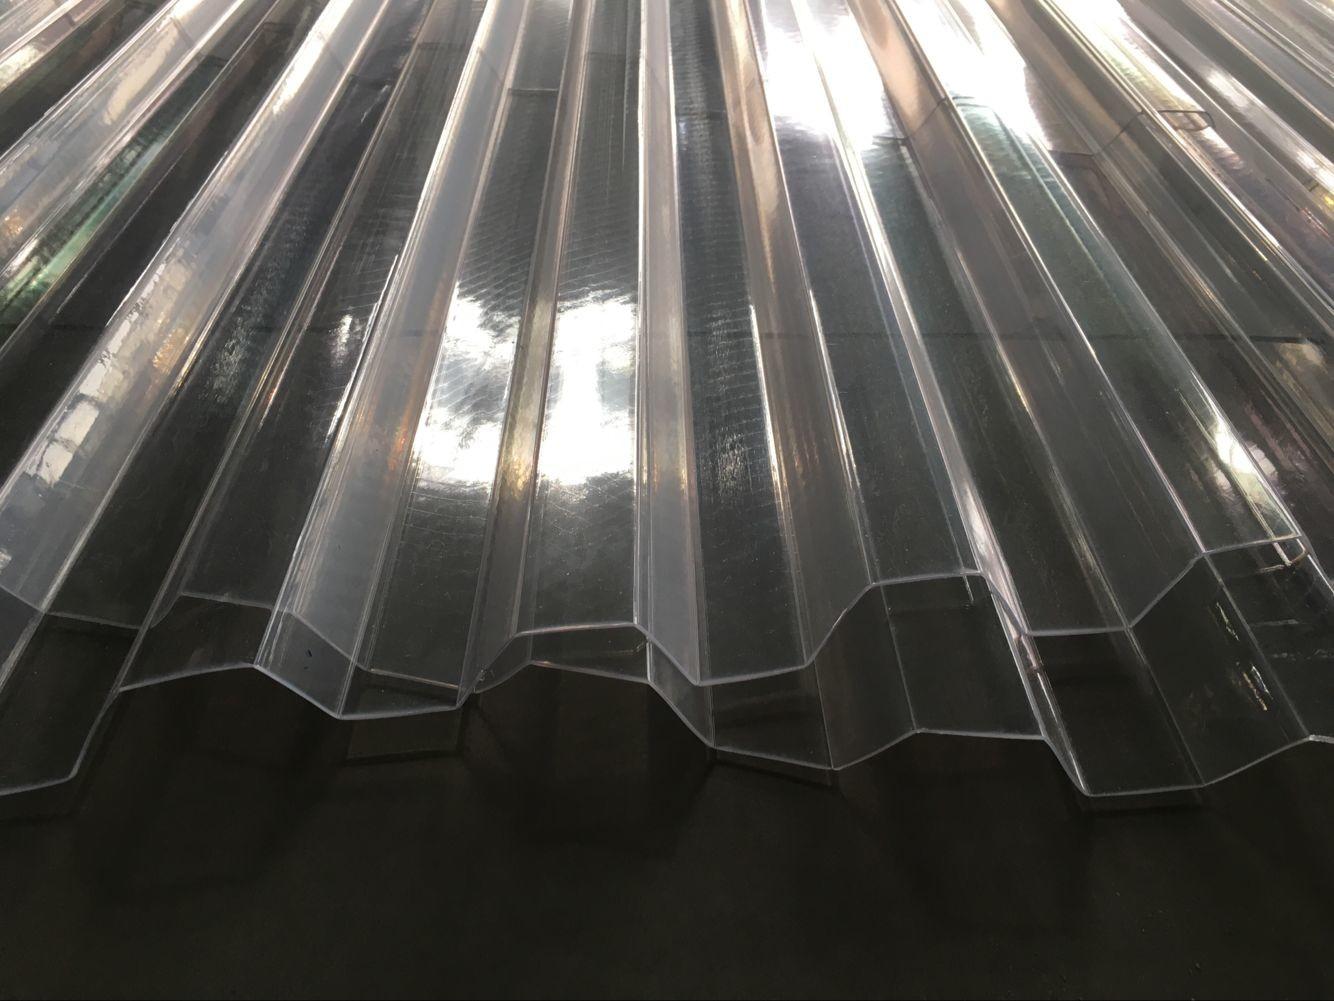 Pvc Clear Plastic Roof Tile Machine For Transparent Roof